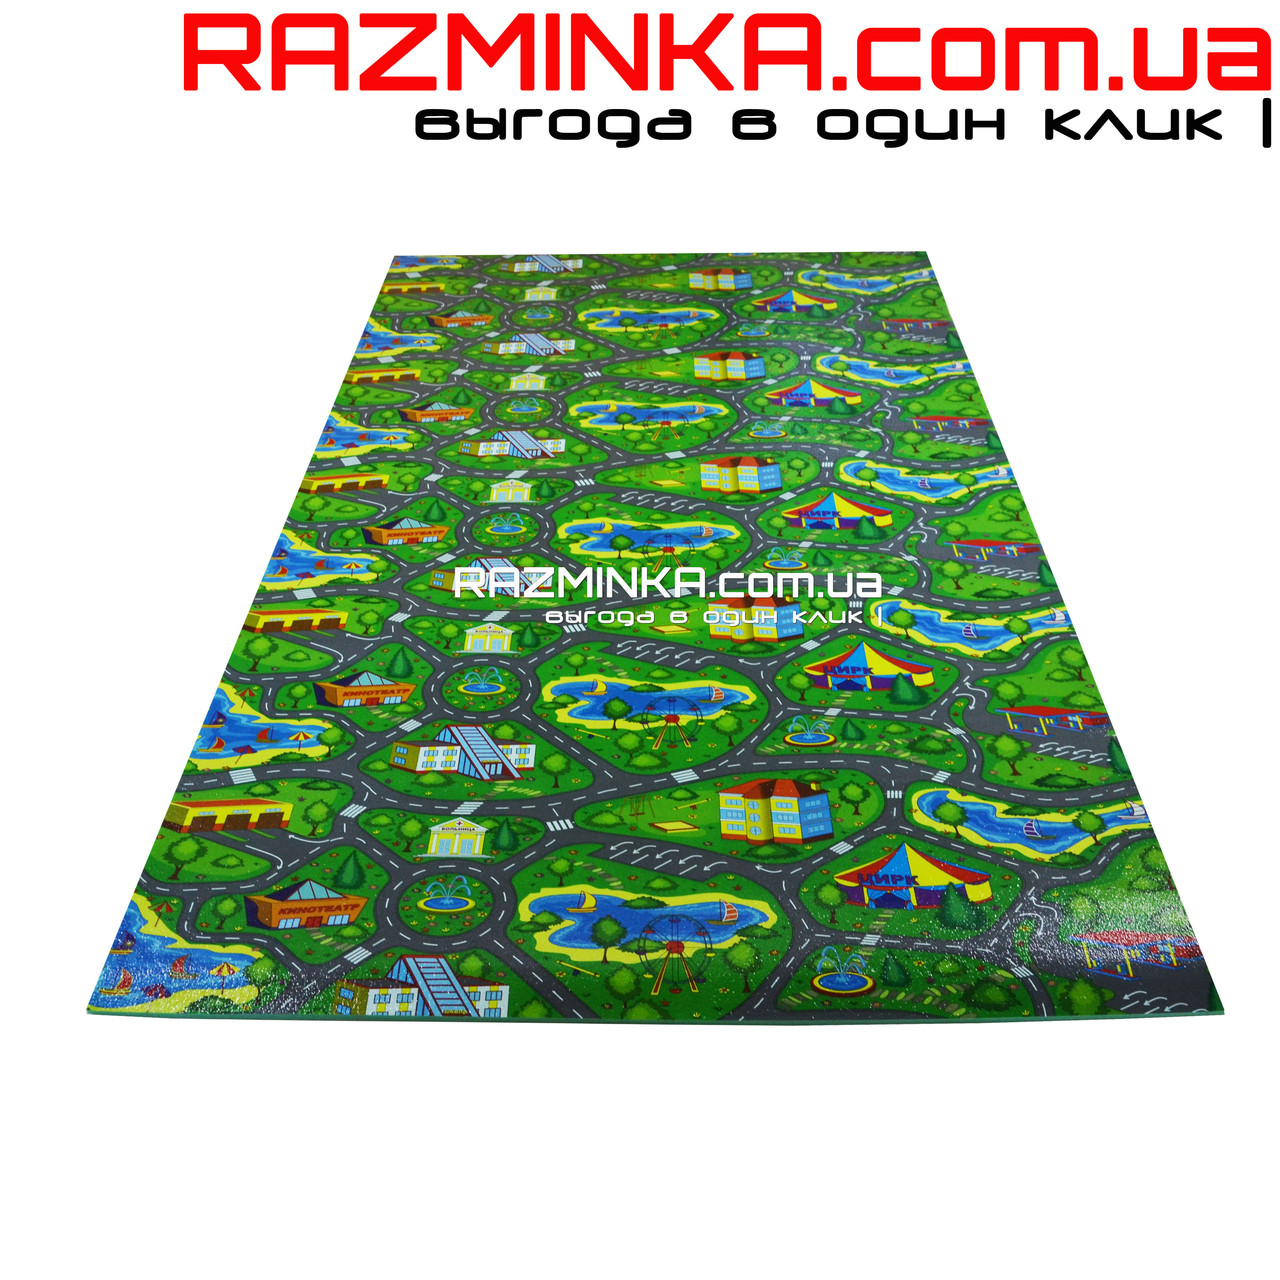 Детский развивающий игровой коврик Автодорога Приключений 200х110, толщина 8мм